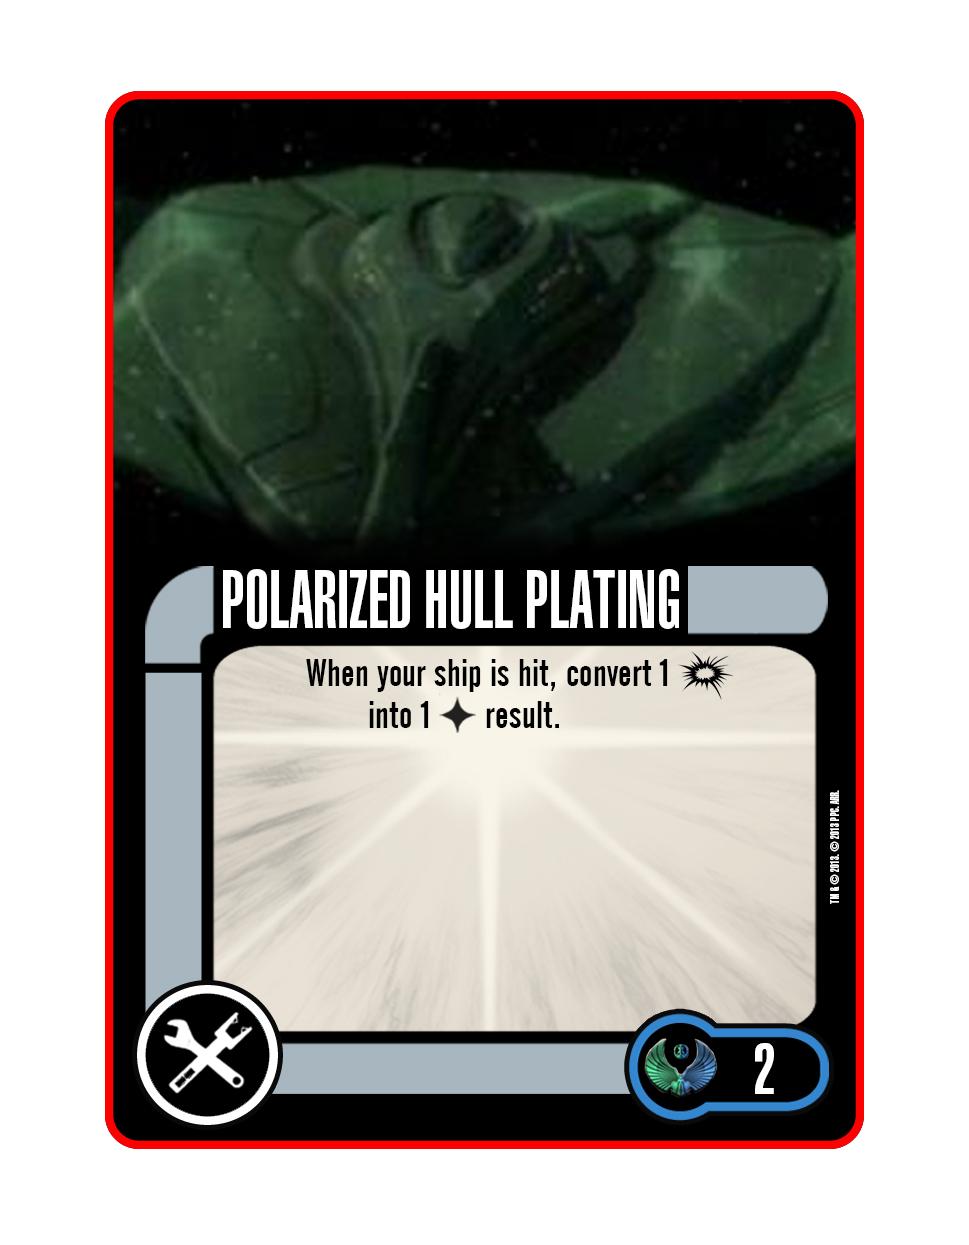 Tech - Polarized Hull Plating